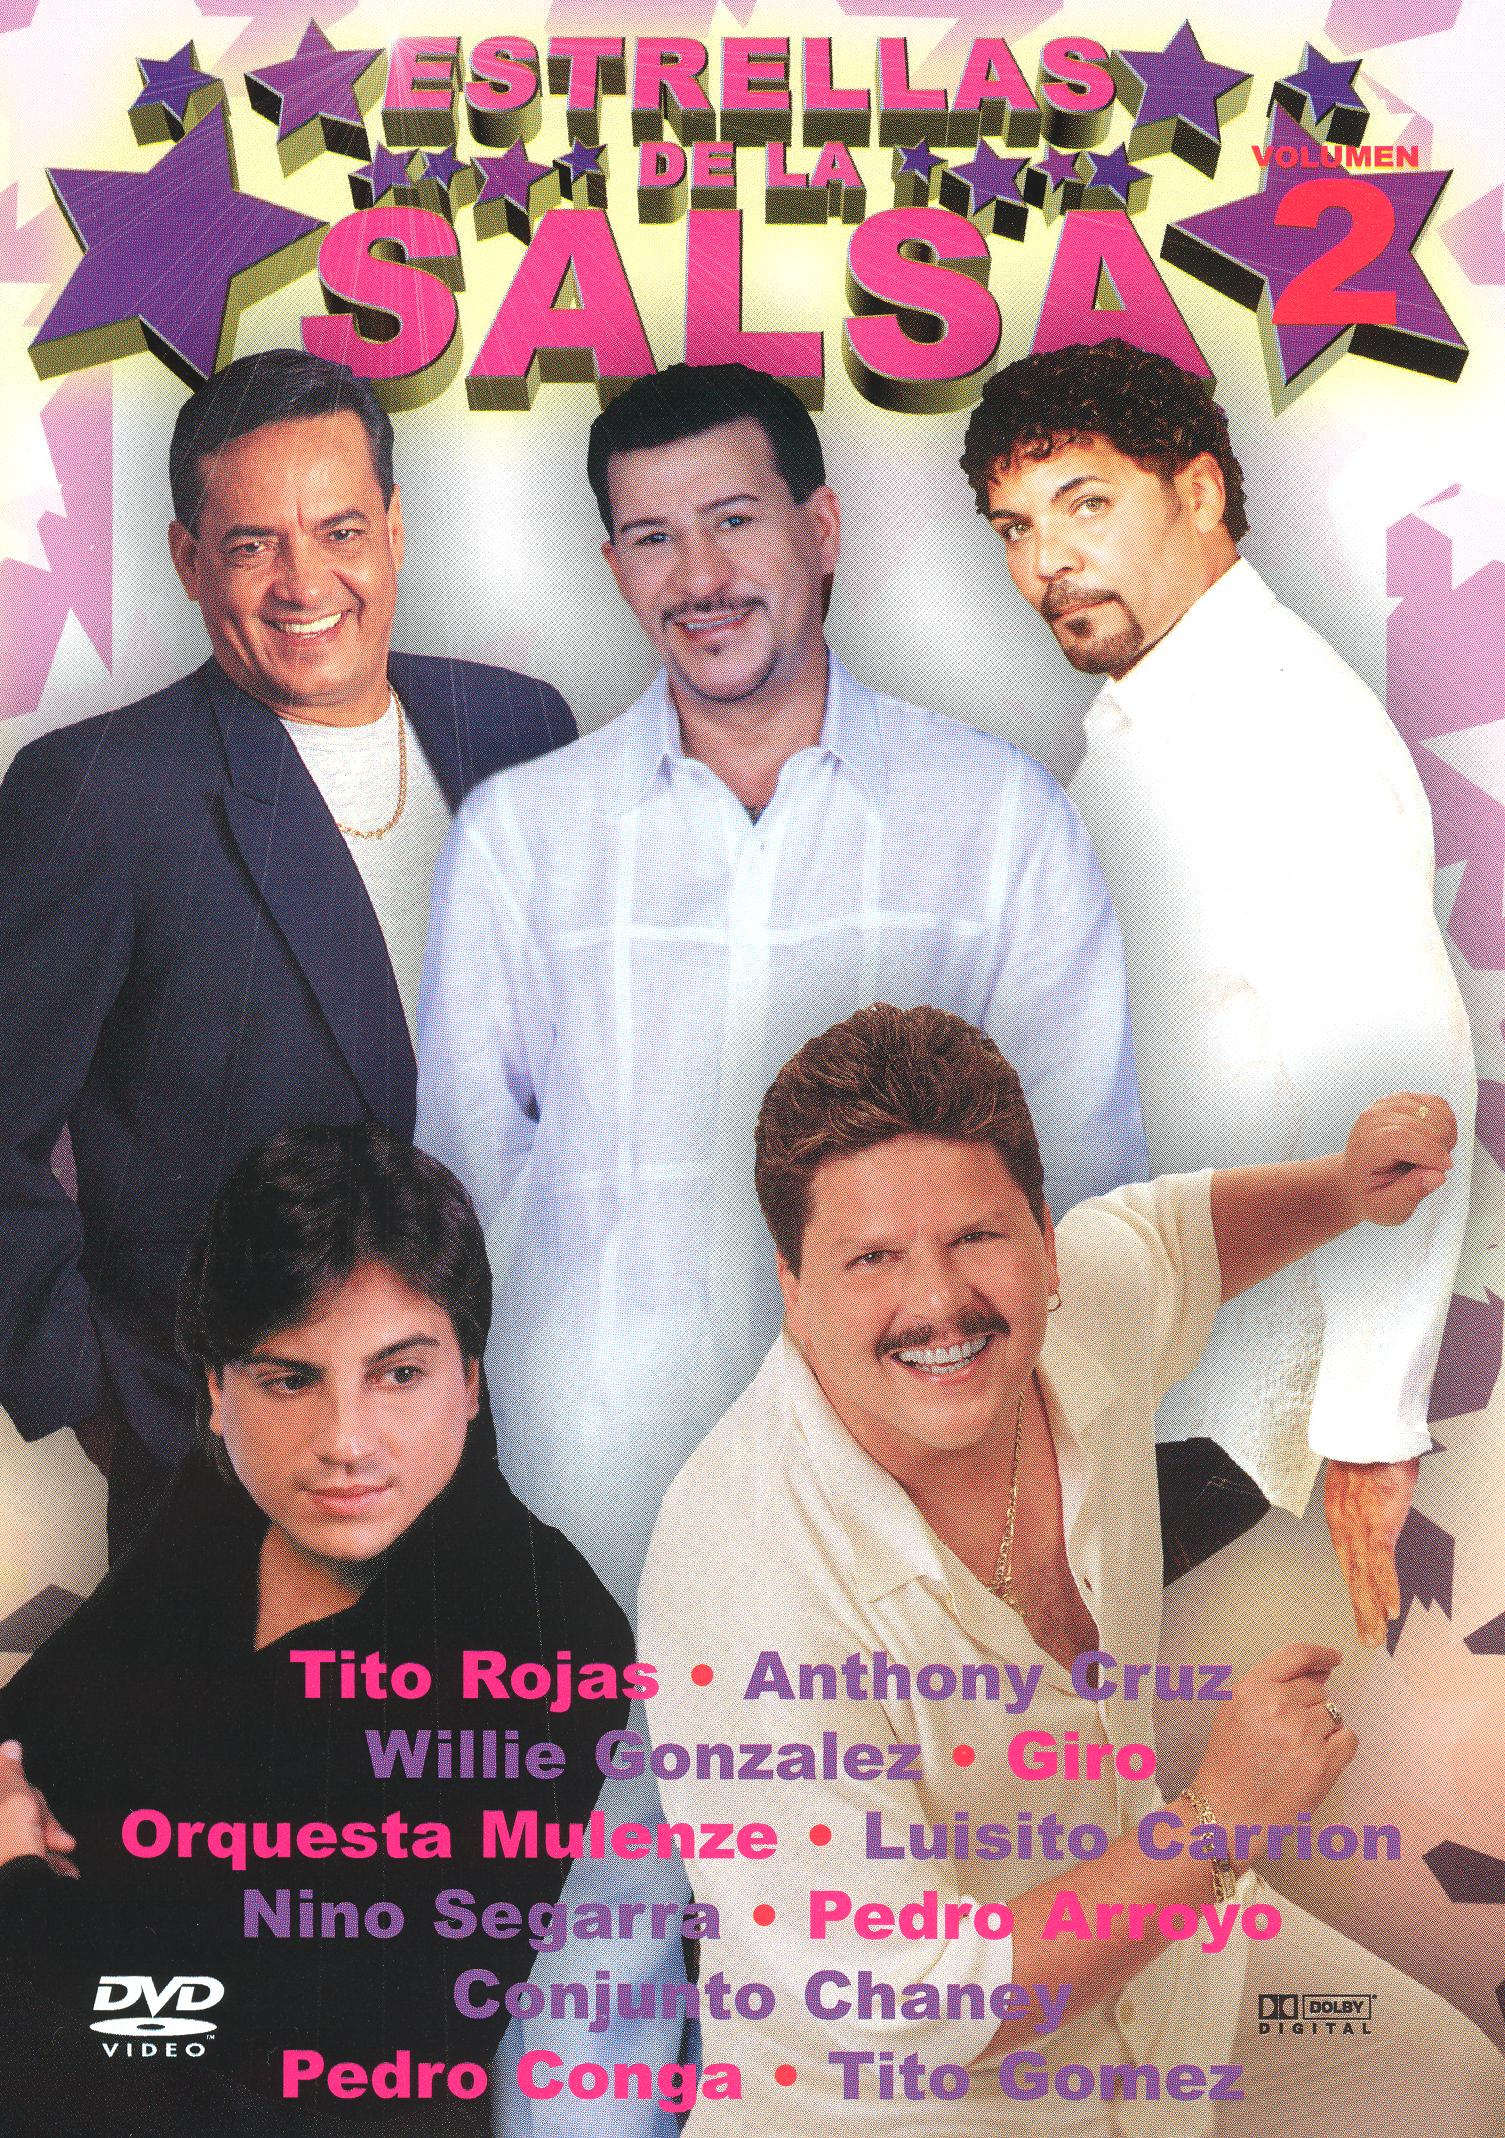 Estrellas de la Salsa, Vol. 2